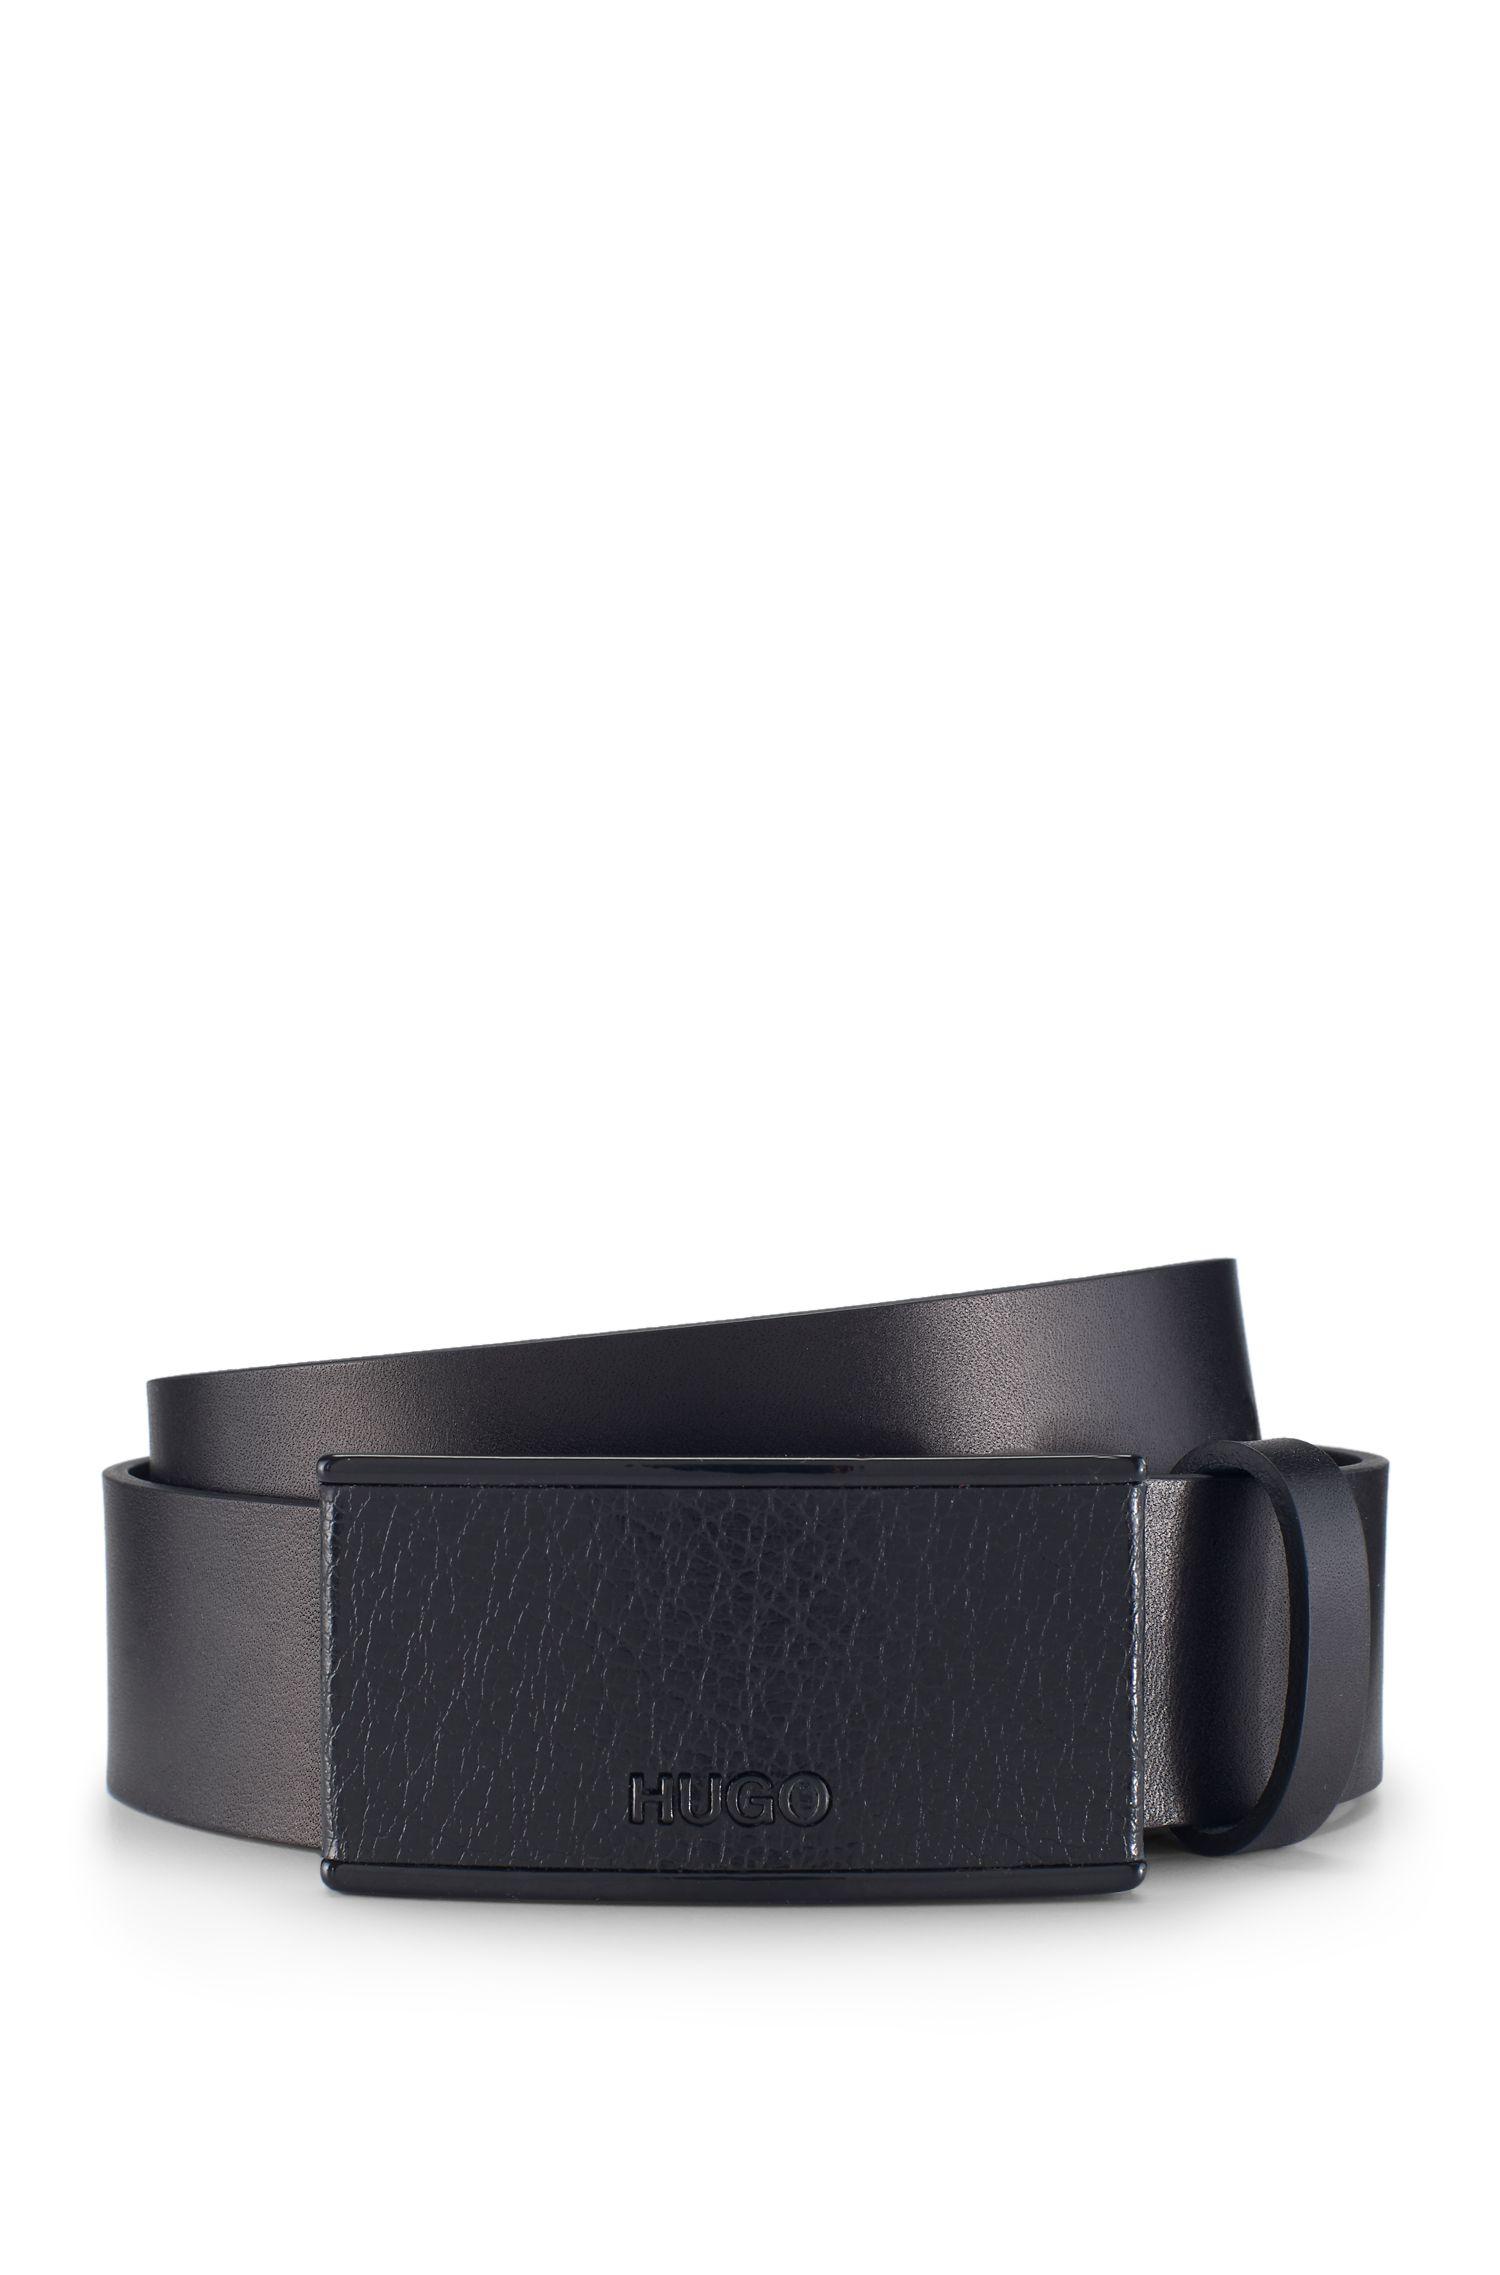 Leather Belt | Gerdy